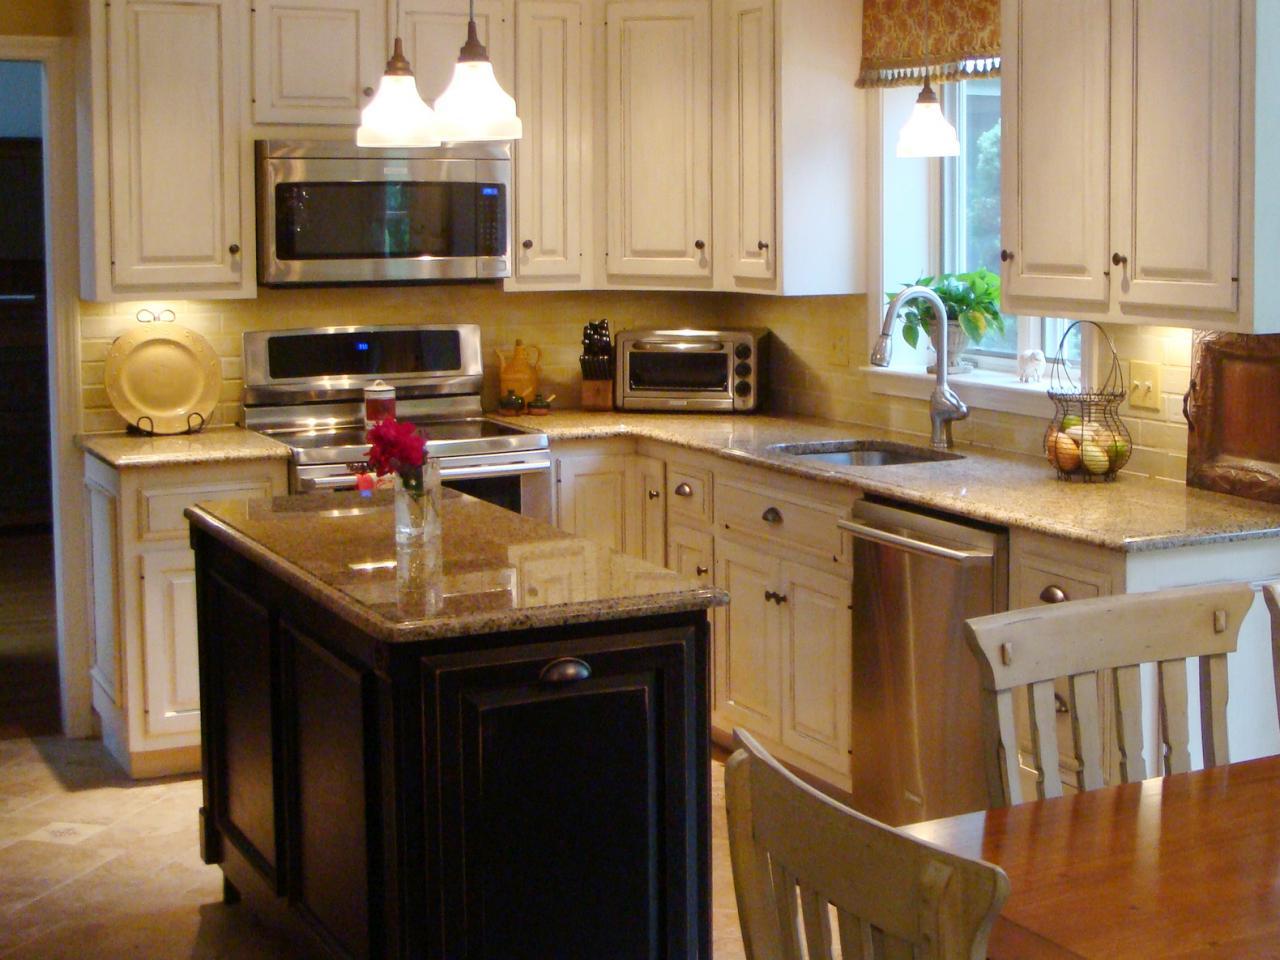 kitchen design ideas for small kitchens island photo - 4